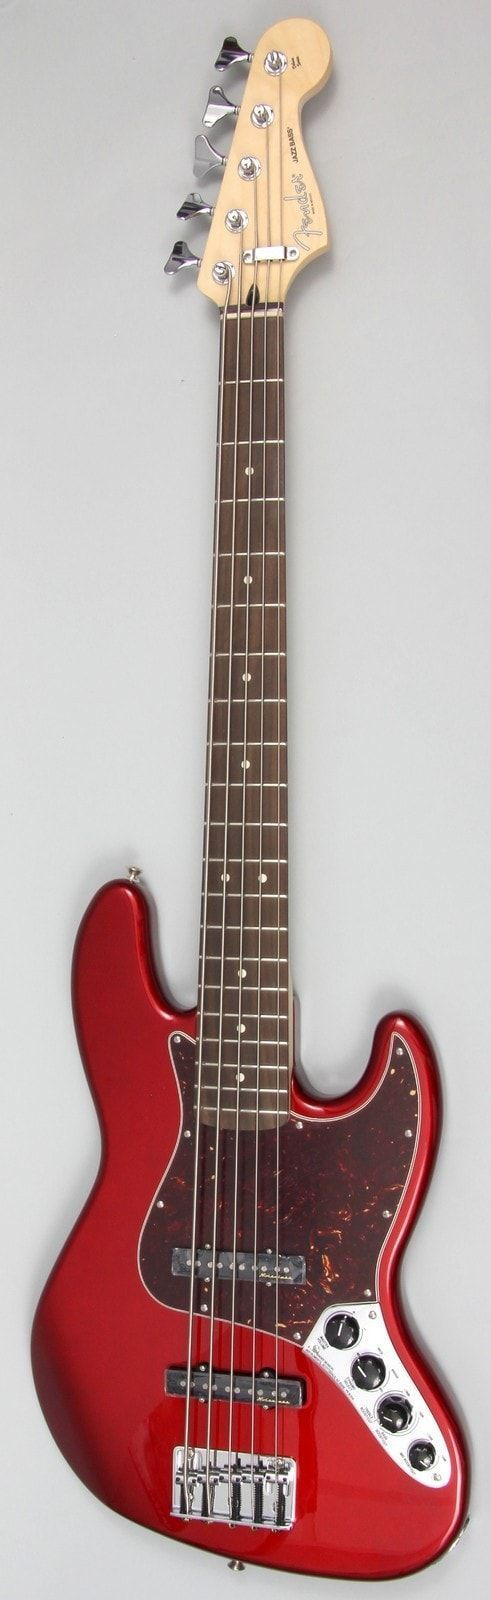 fender deluxe active jazz bass v 5 string products fender deluxe bass guitar. Black Bedroom Furniture Sets. Home Design Ideas